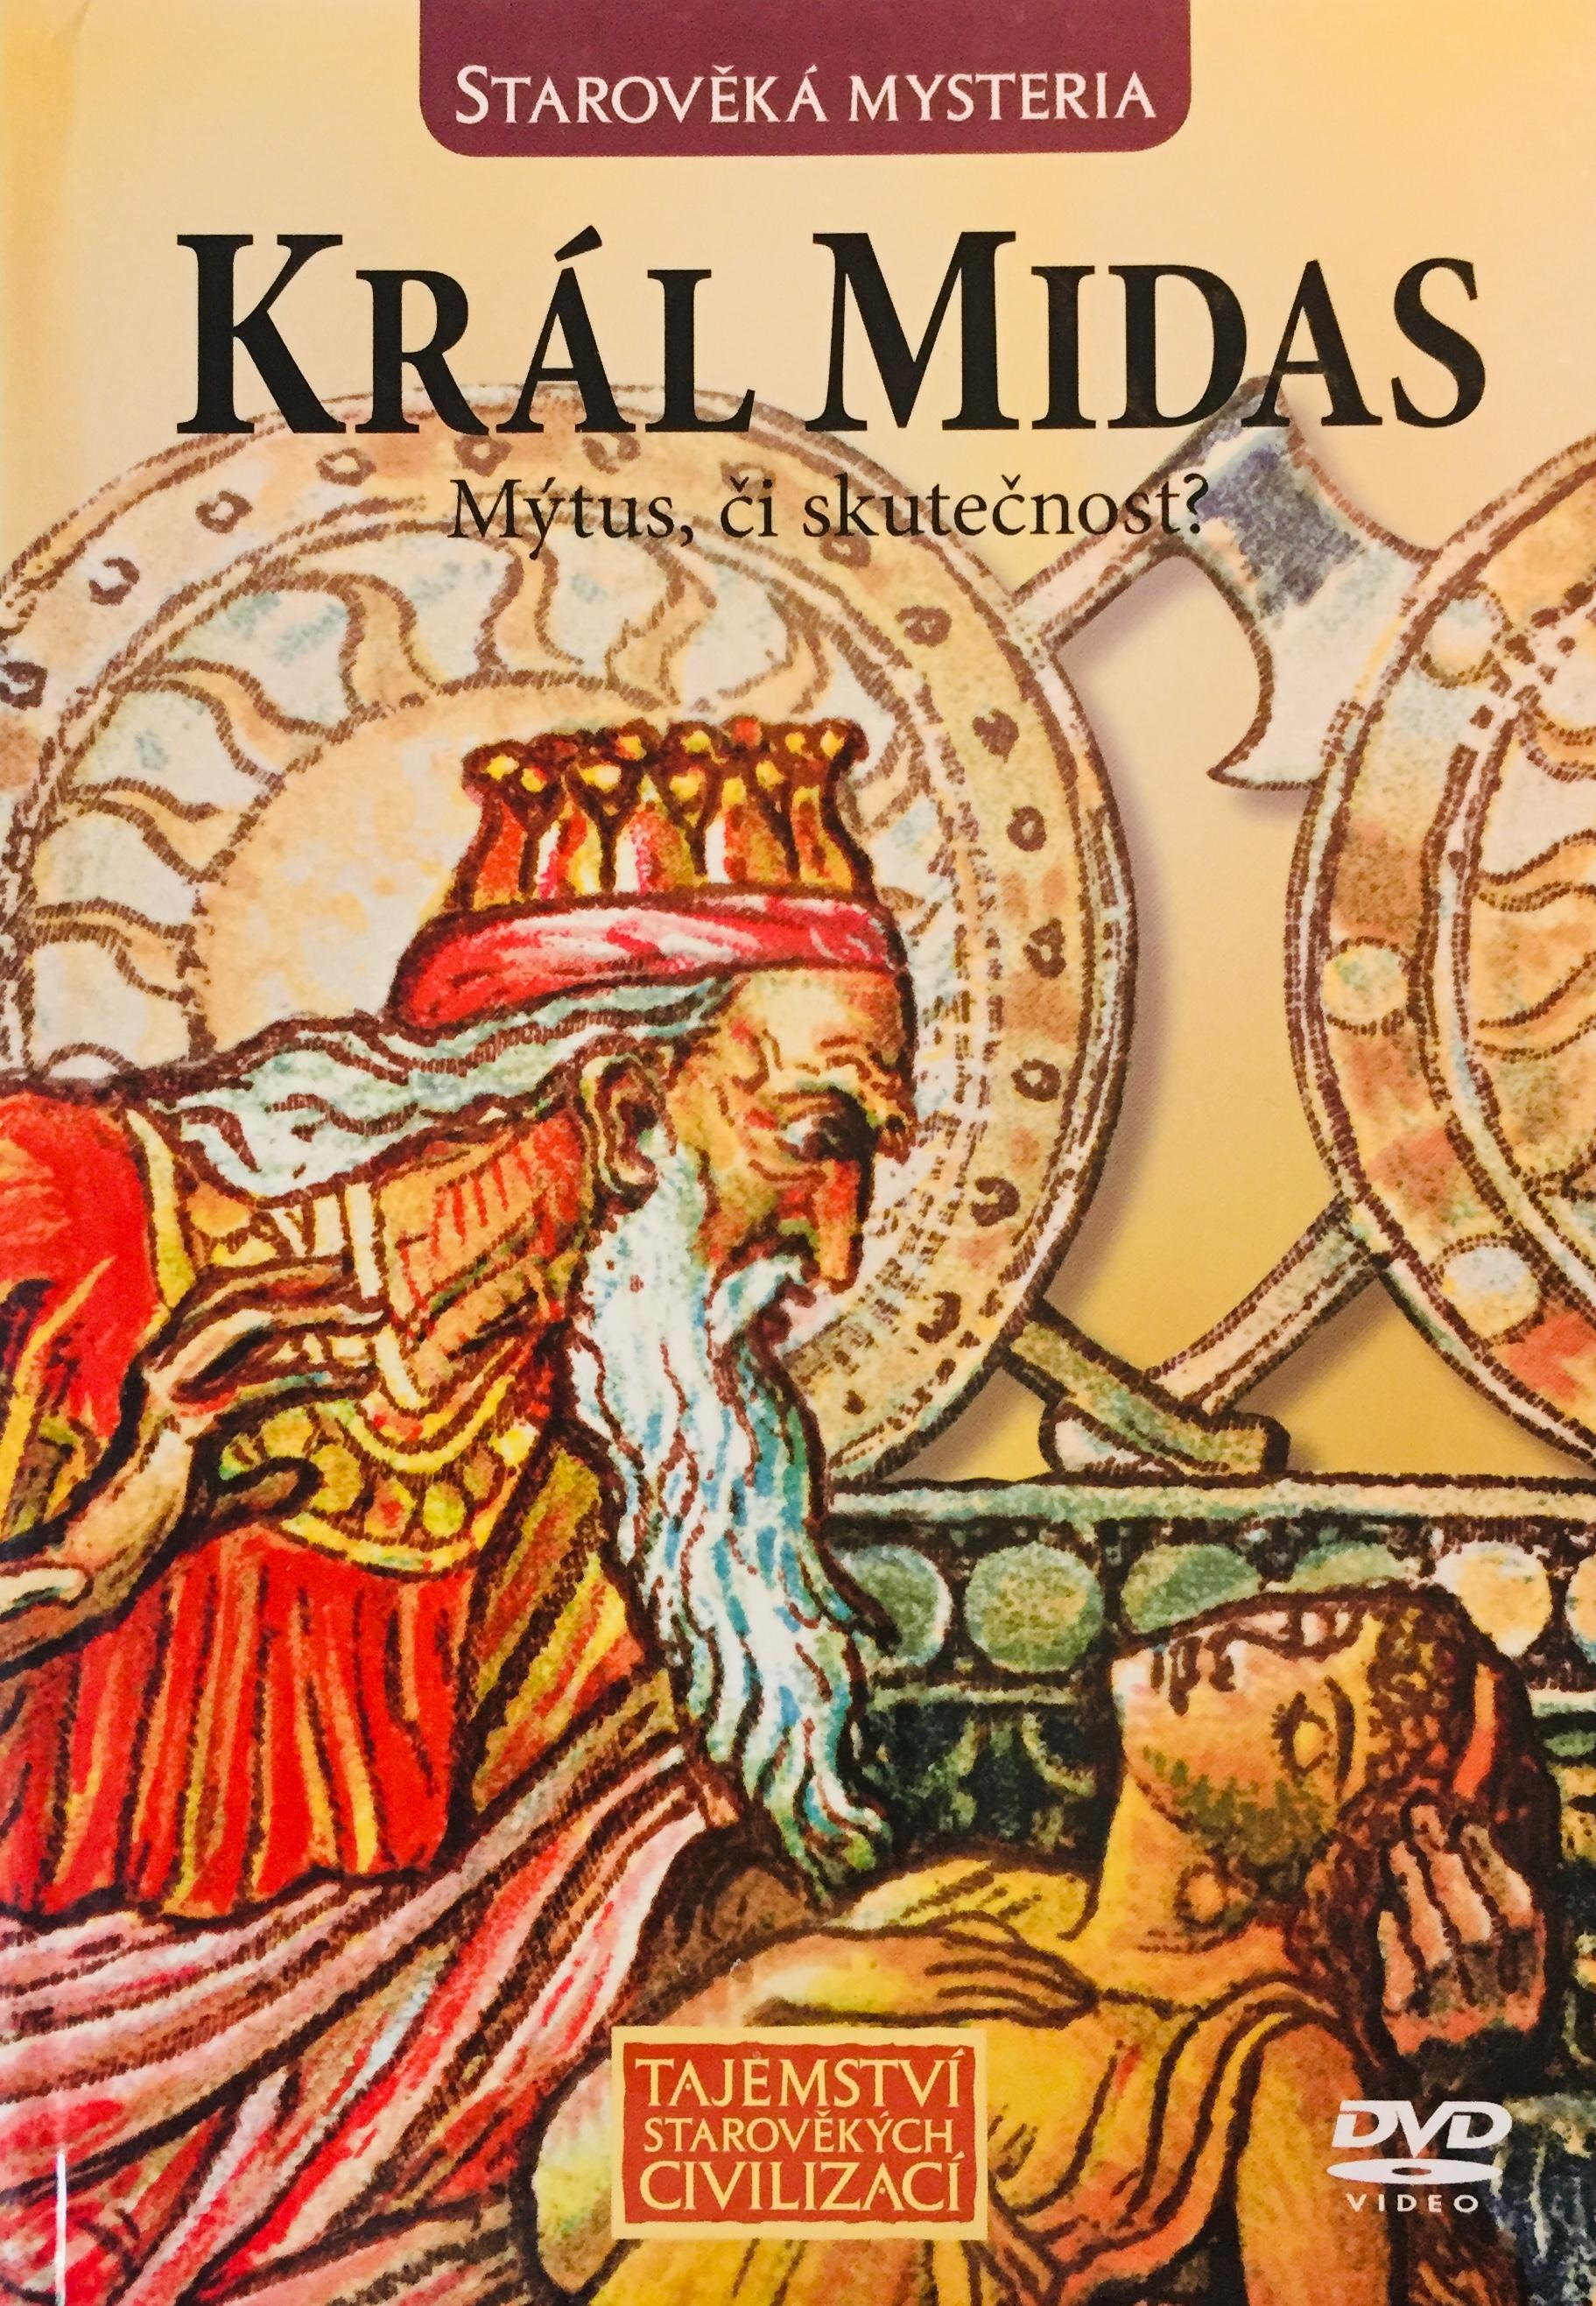 Starověká mysteria - Král Midas - DVD /brožura/